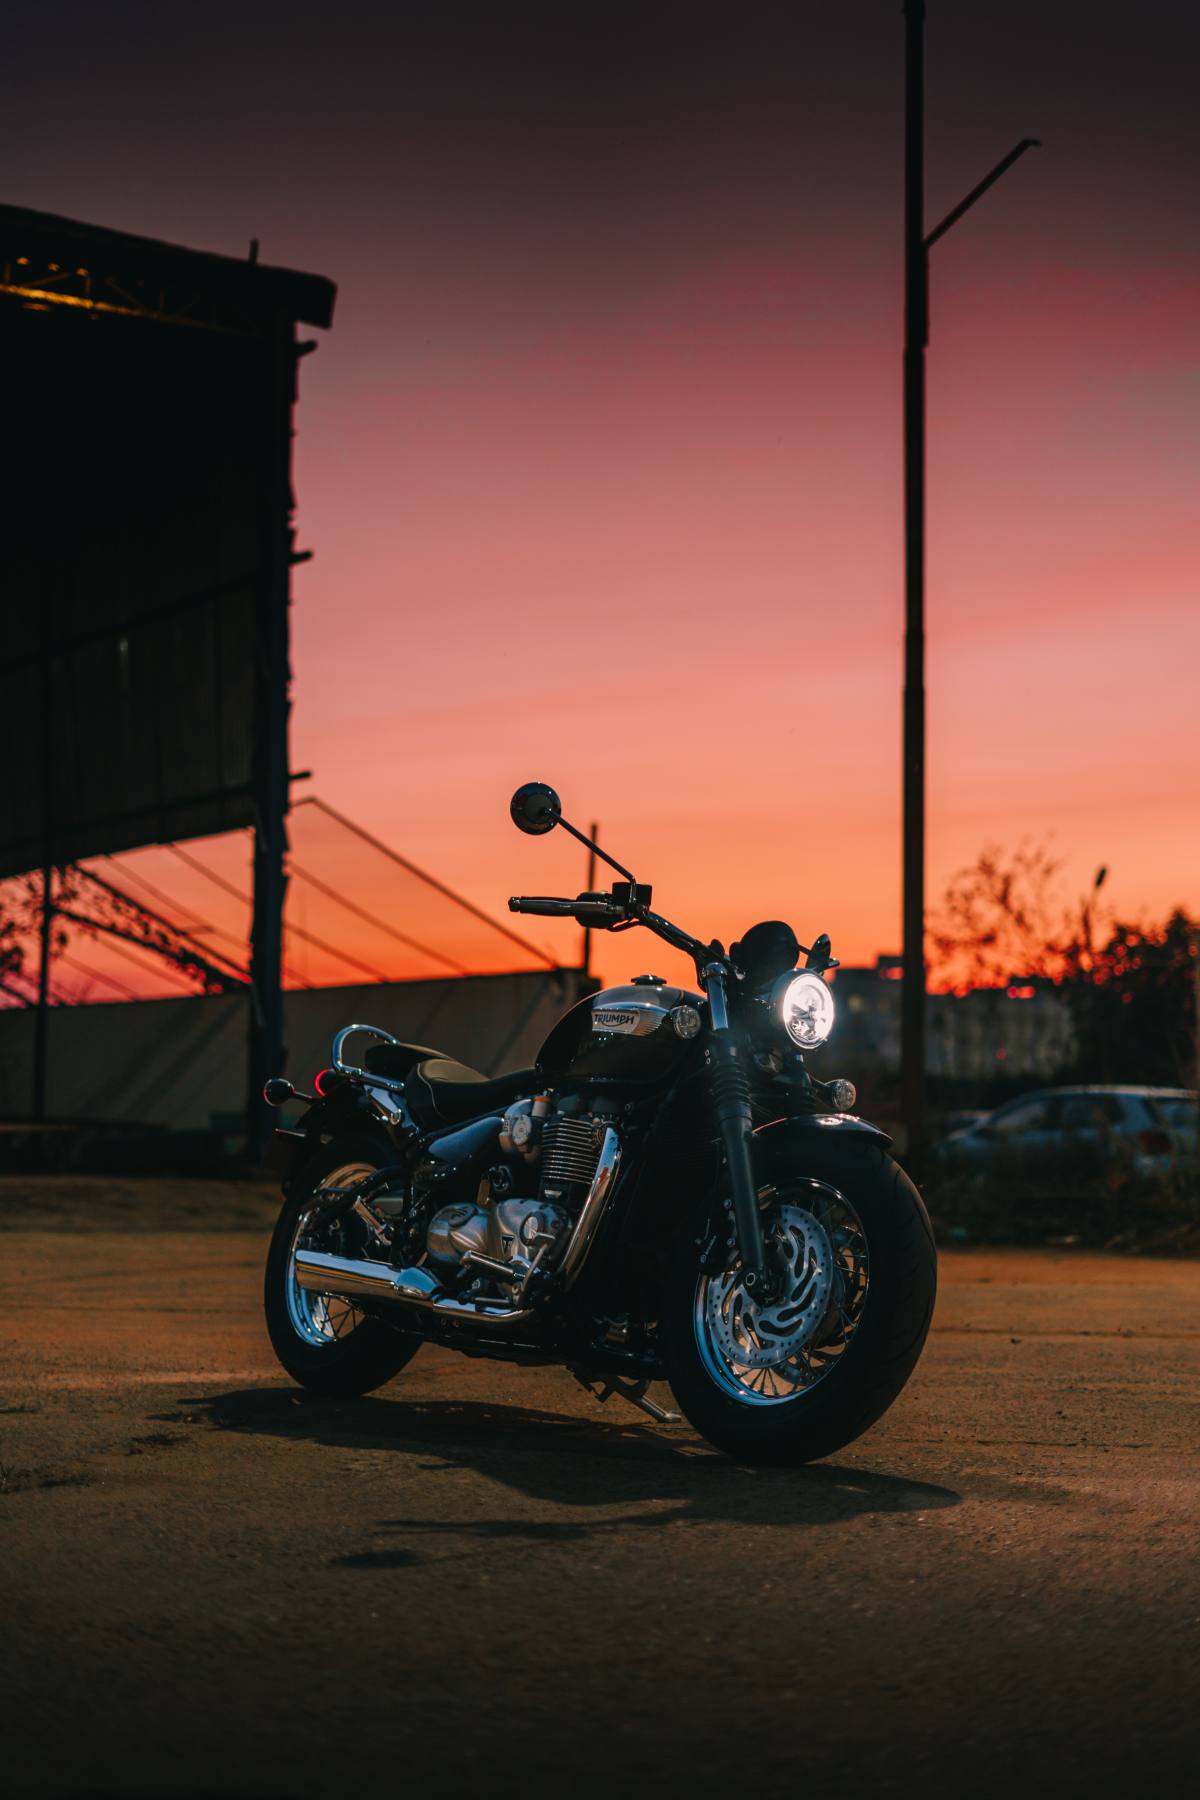 motocyklswiatlo.jpg